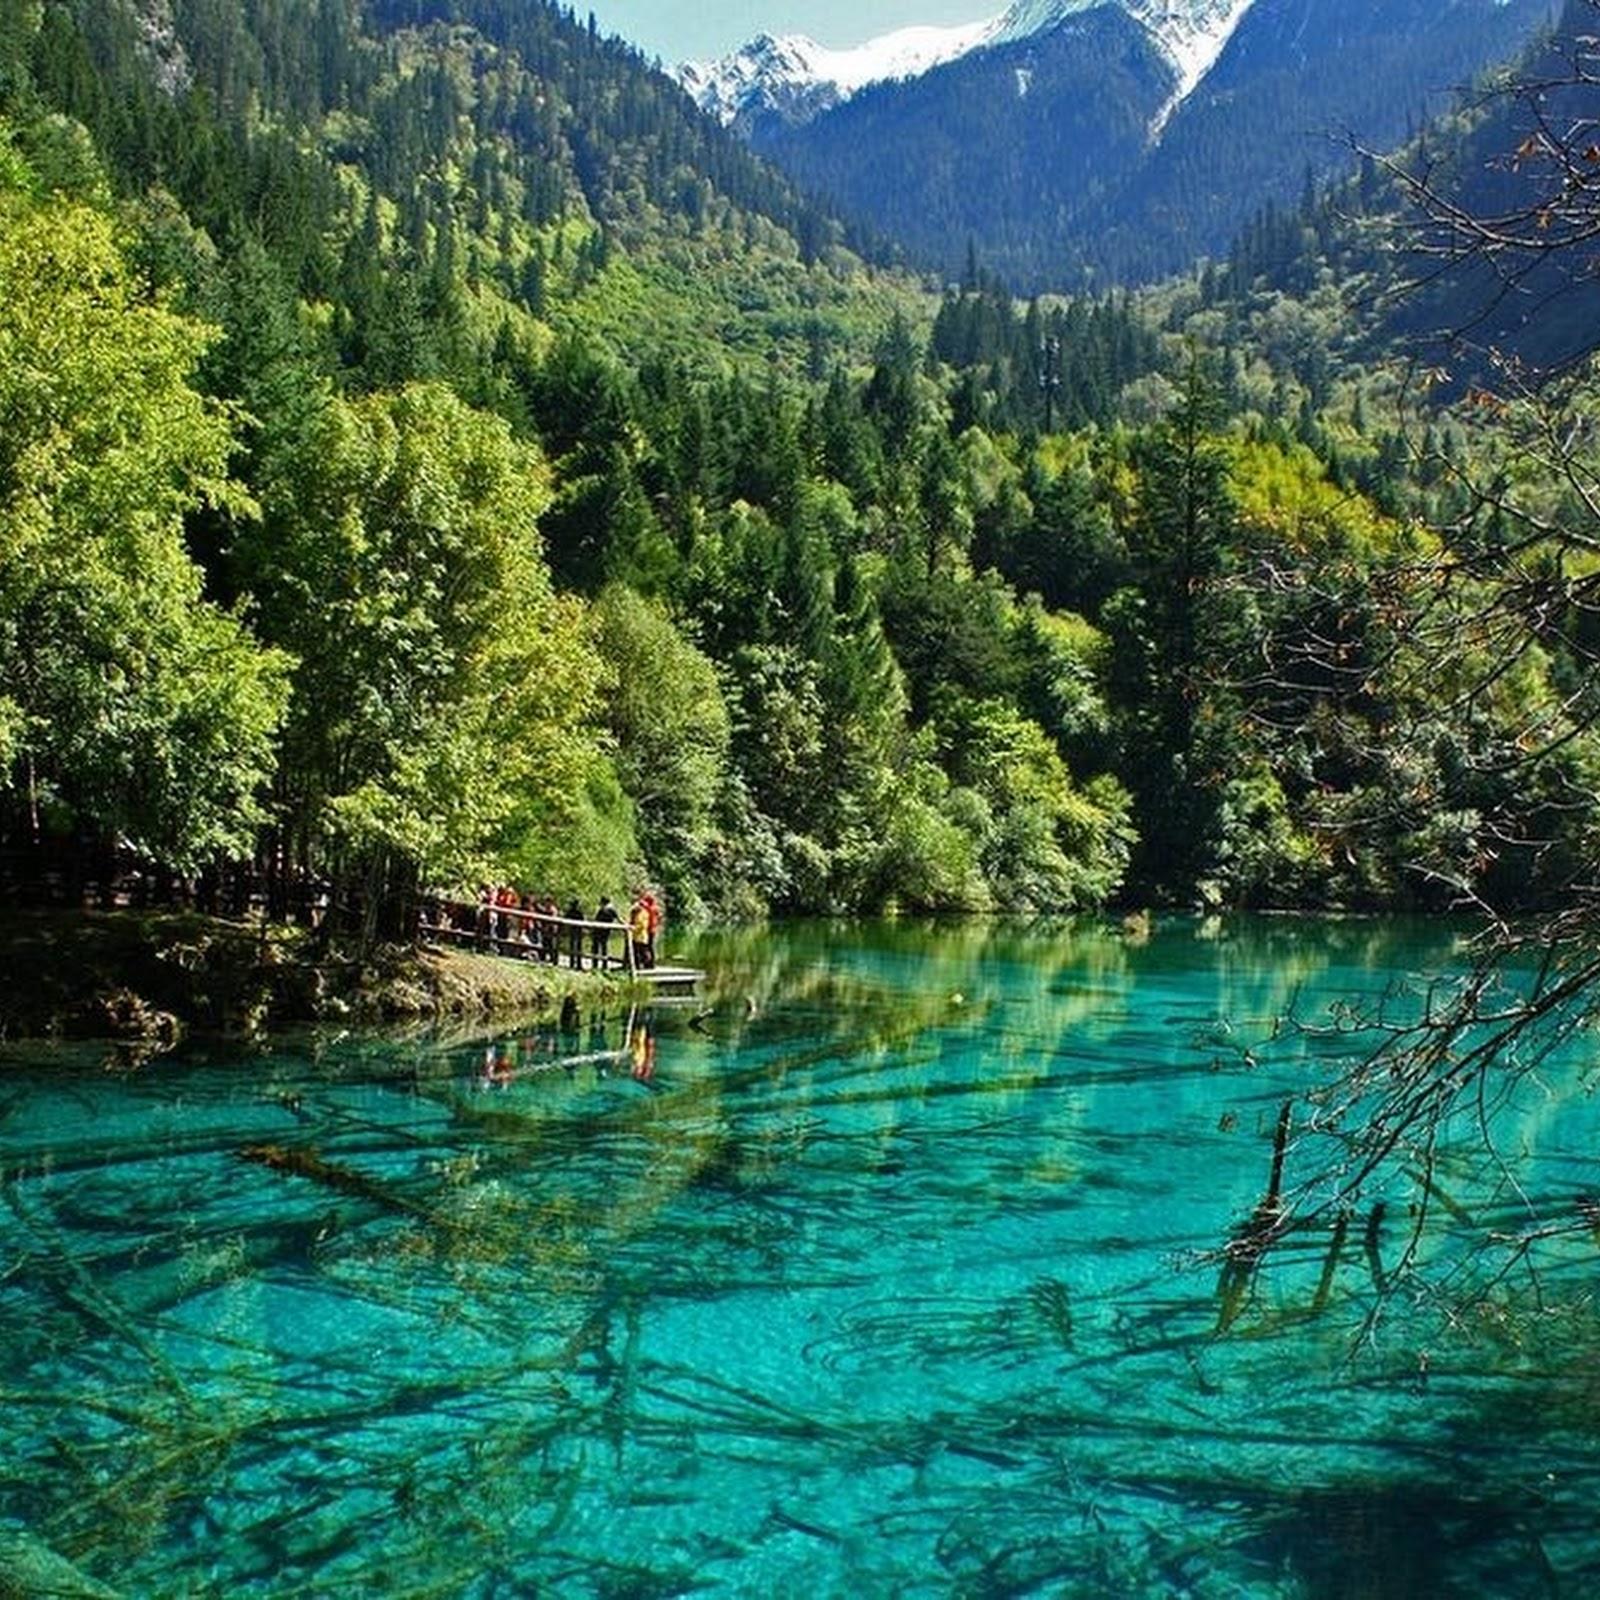 The Alpine Lakes And Waterfalls of Jiuzhaigou